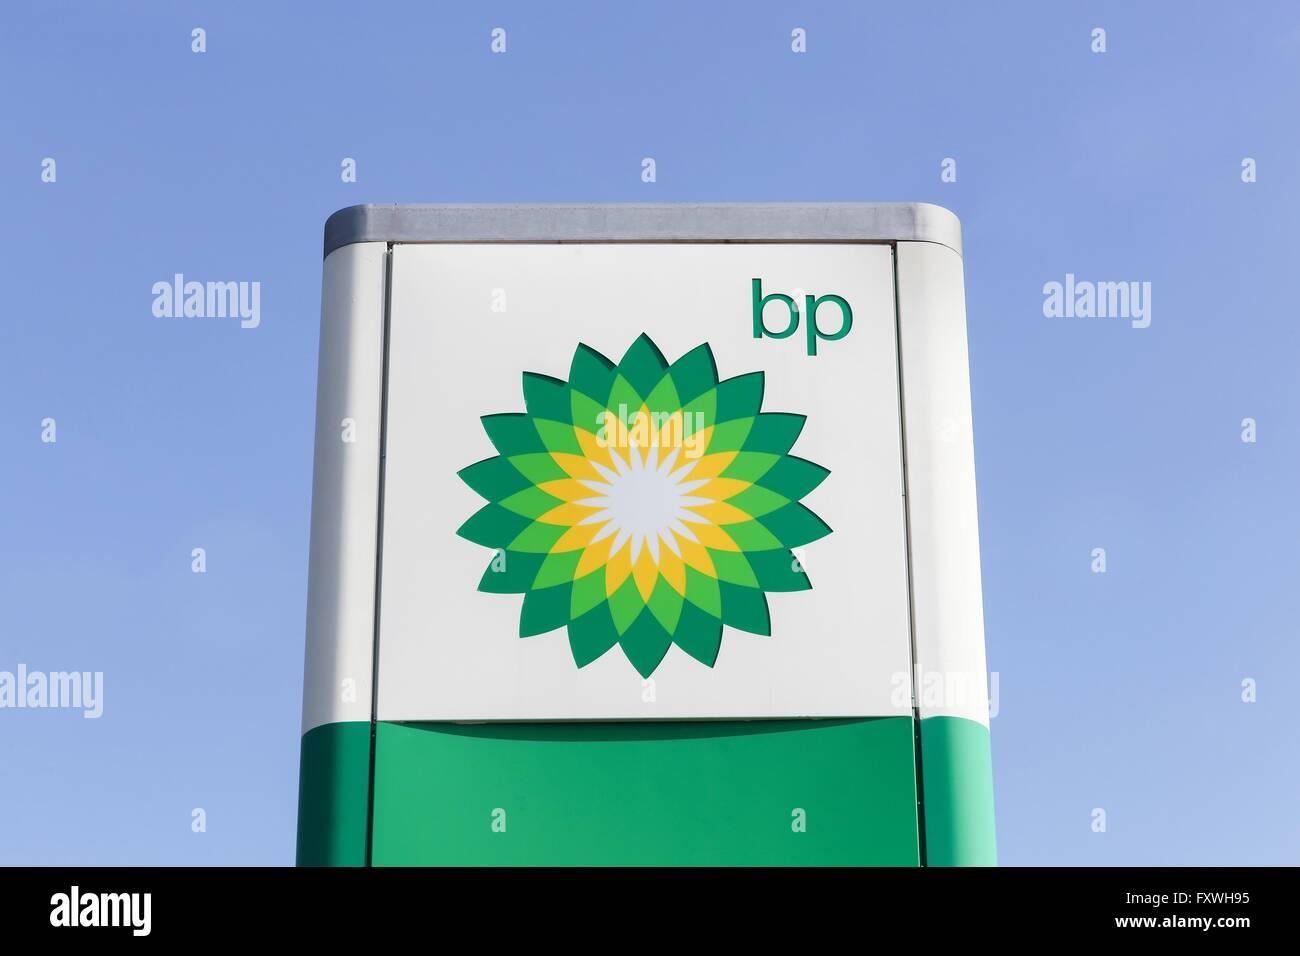 BP logo on a panel Stock Photo